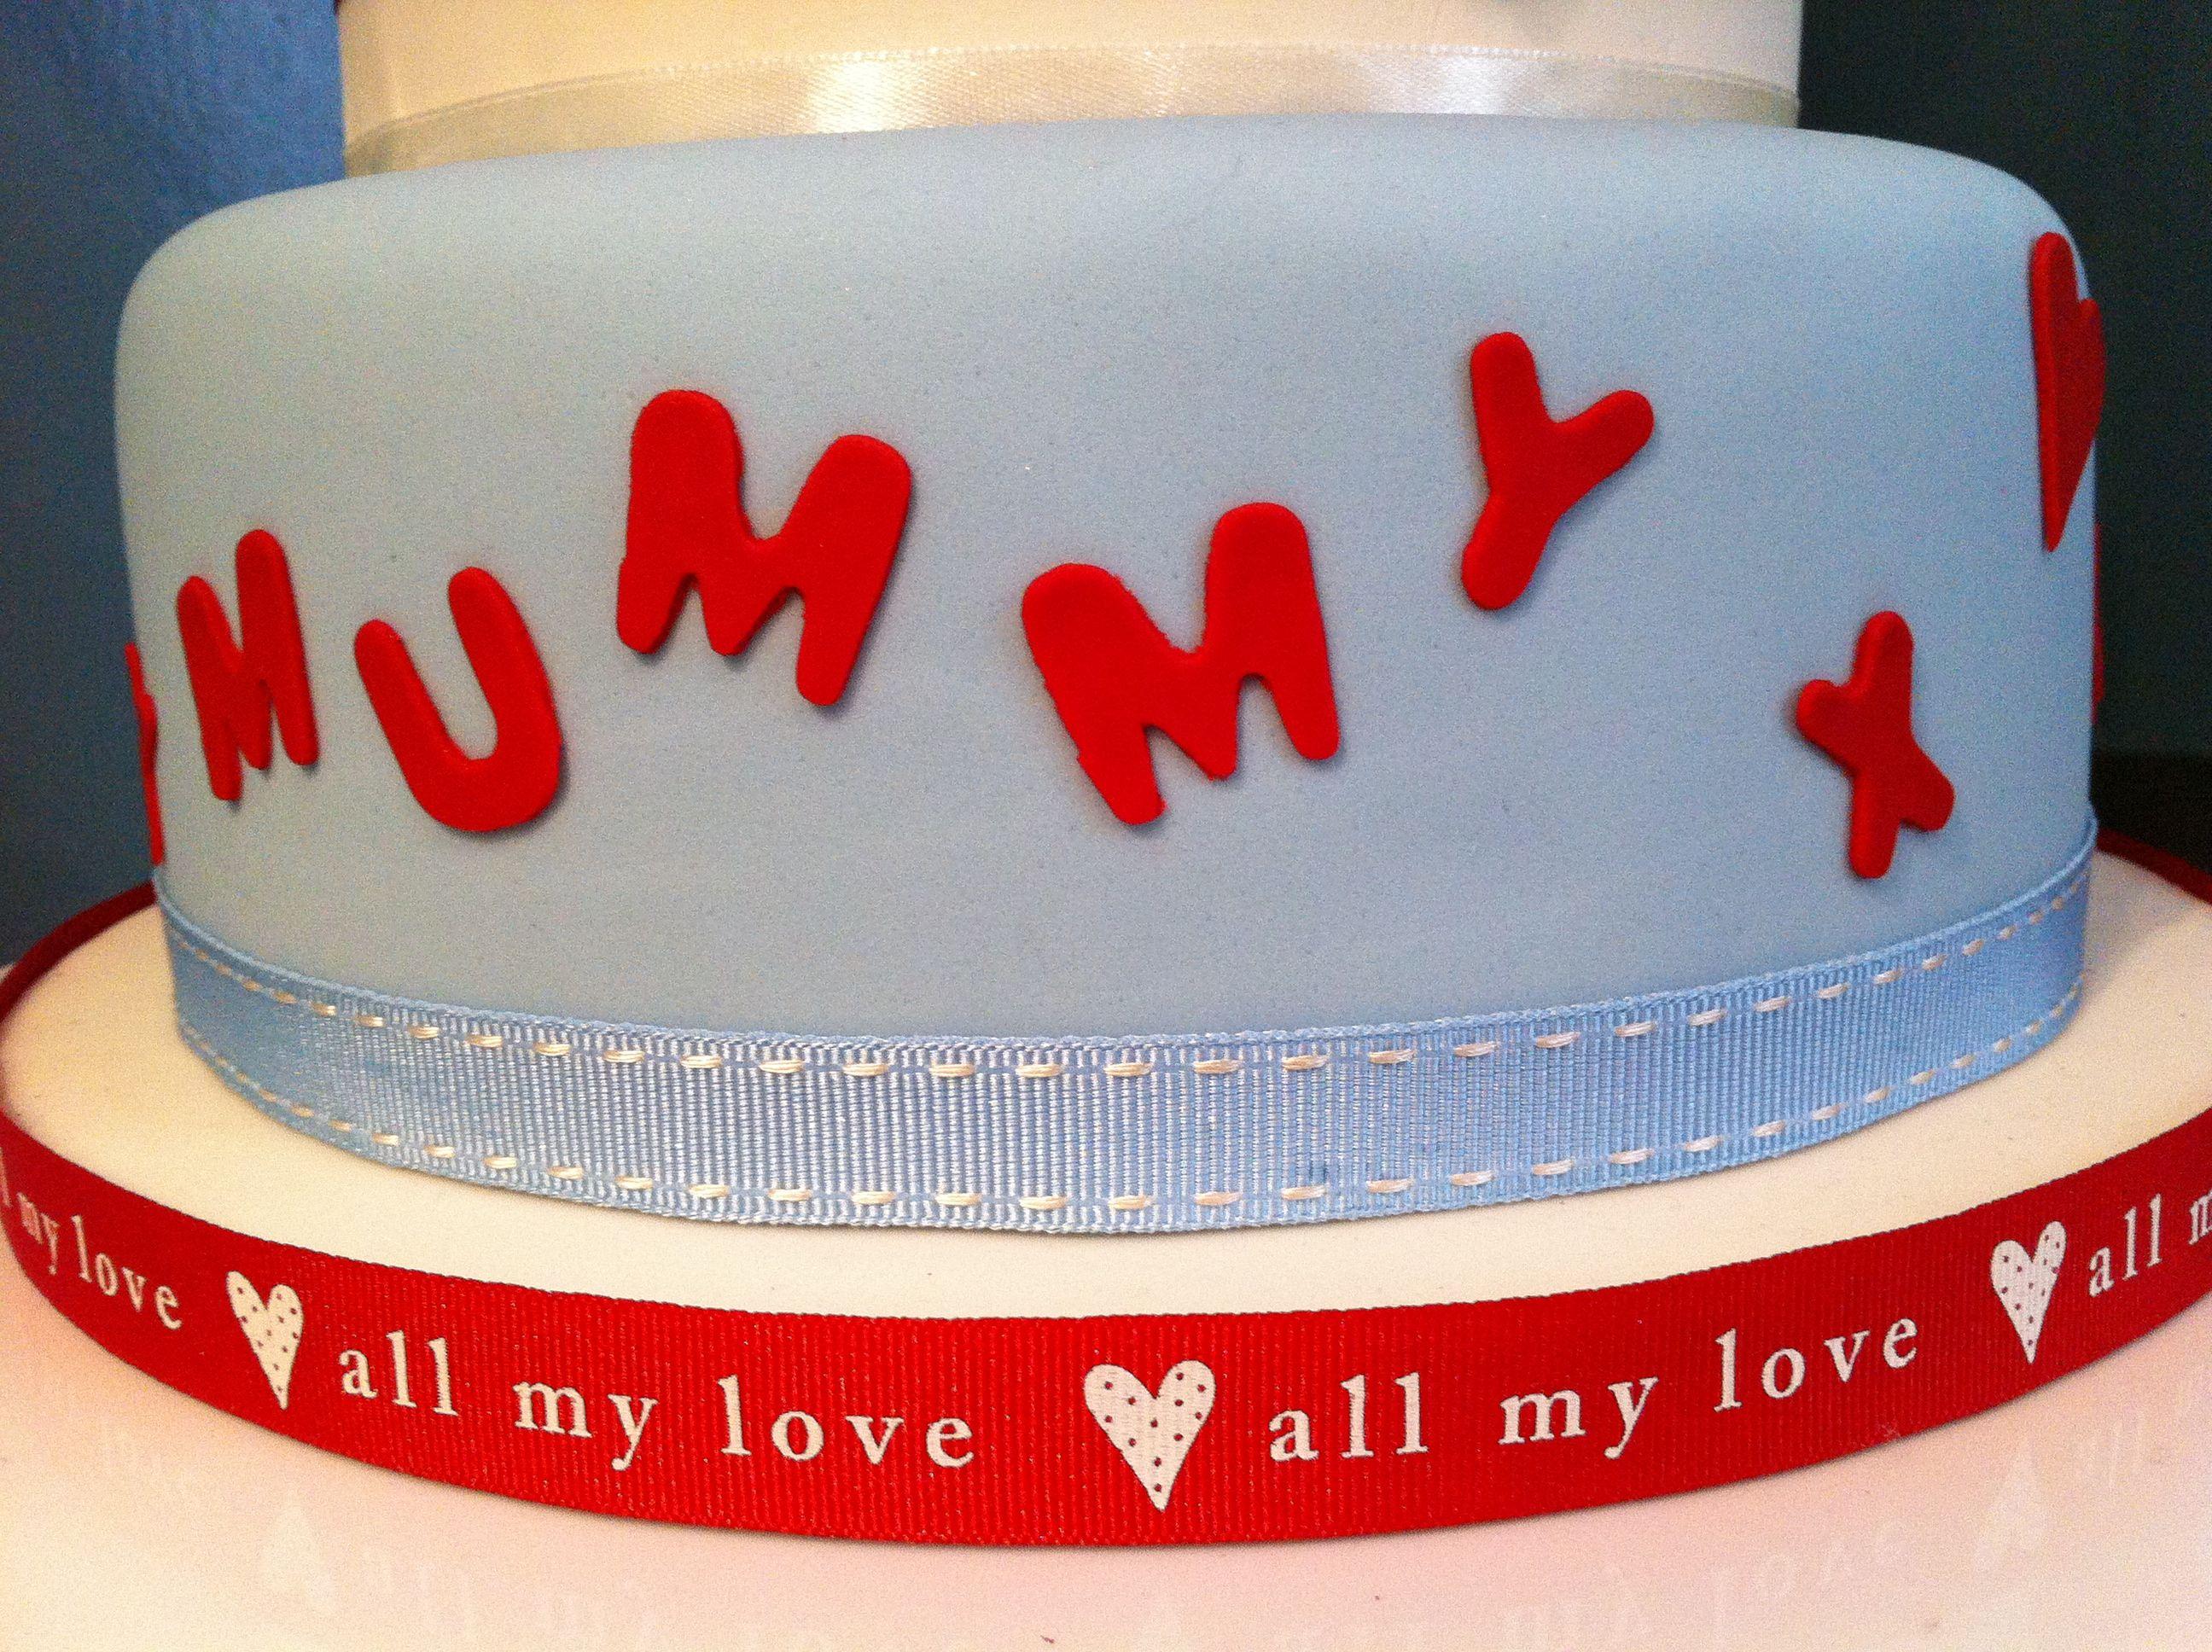 Pin on My Celebration cake business